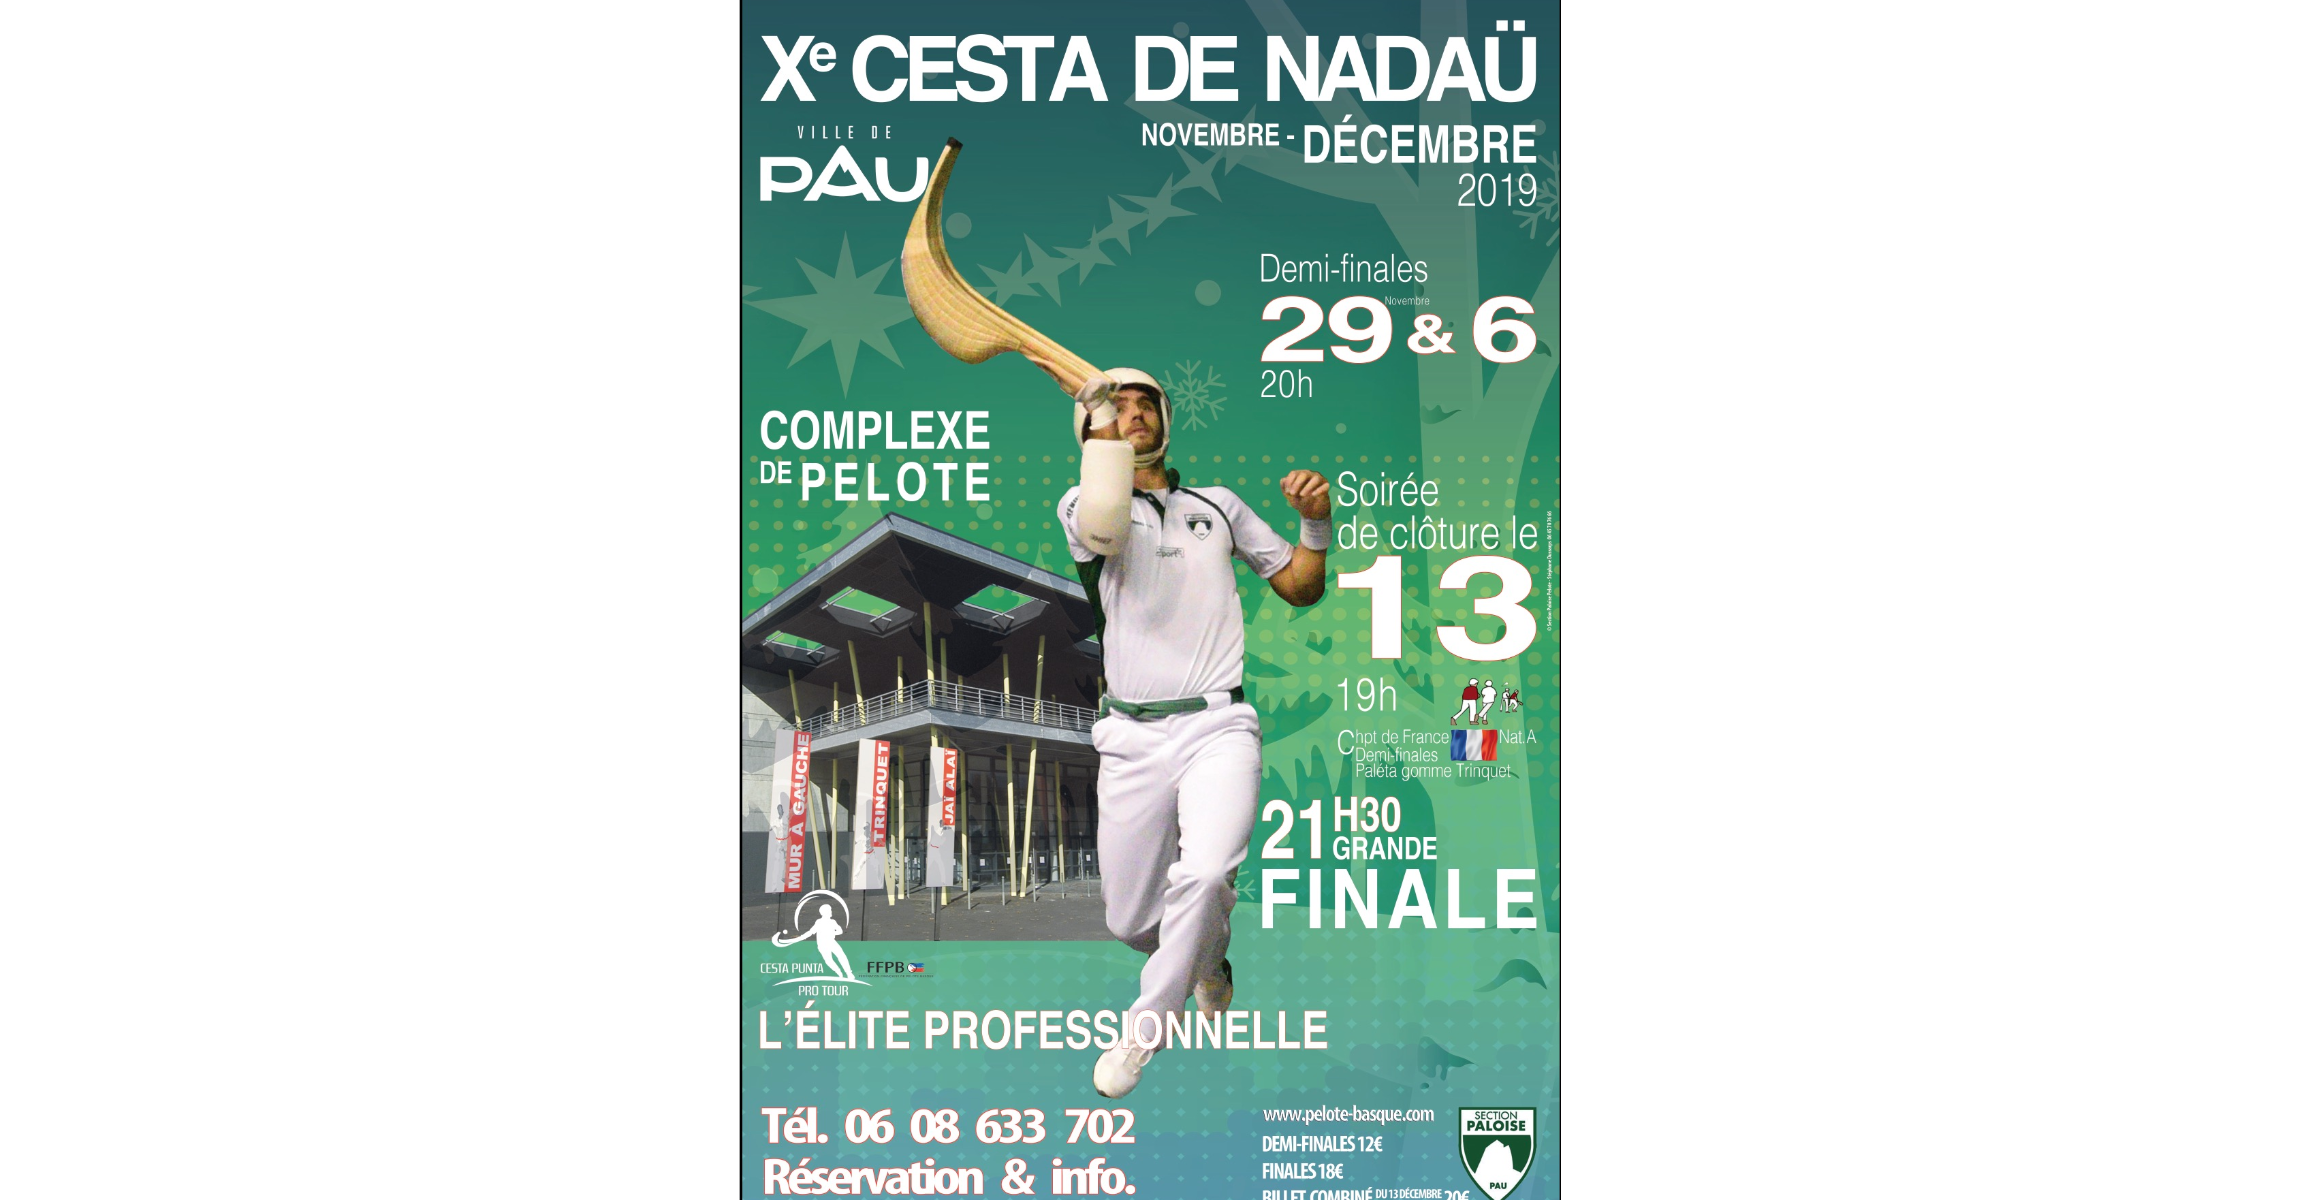 LA REP / COM / CESTA DE NADAU 2019